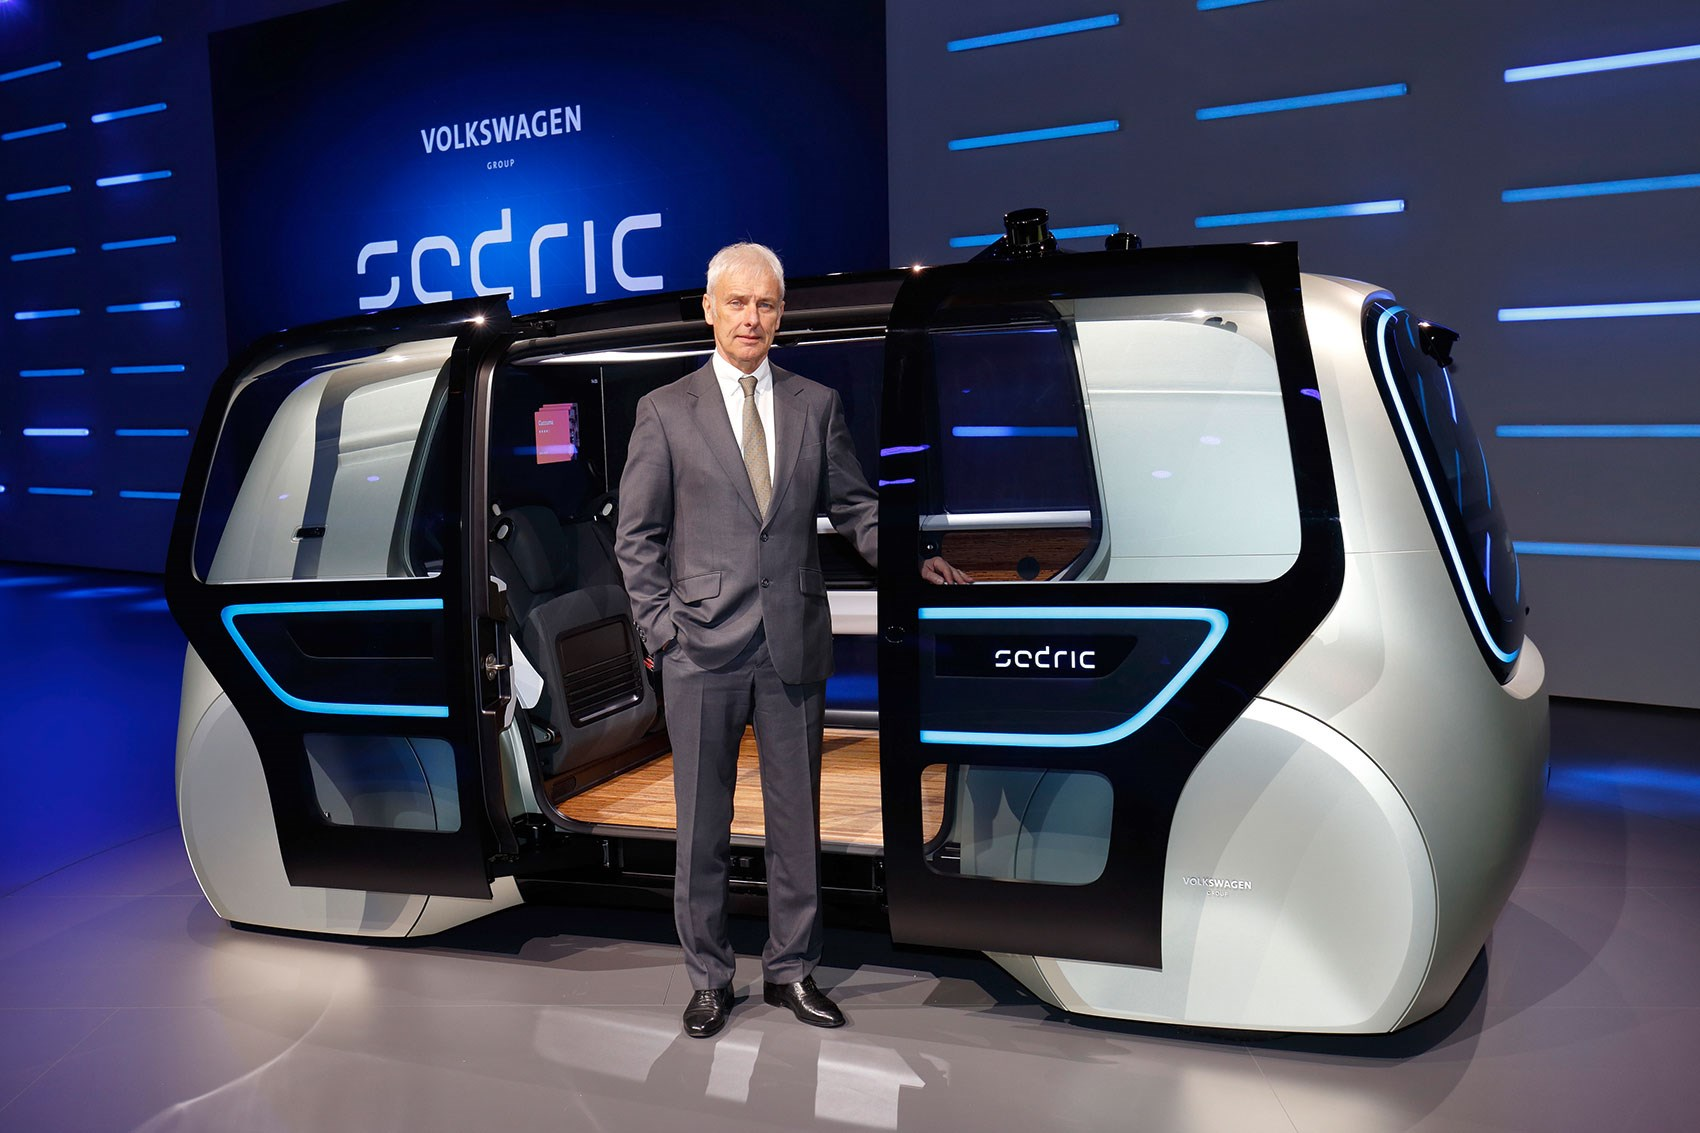 Volkswagen S Pod Cast Sedric Concept At Geneva 2017 By